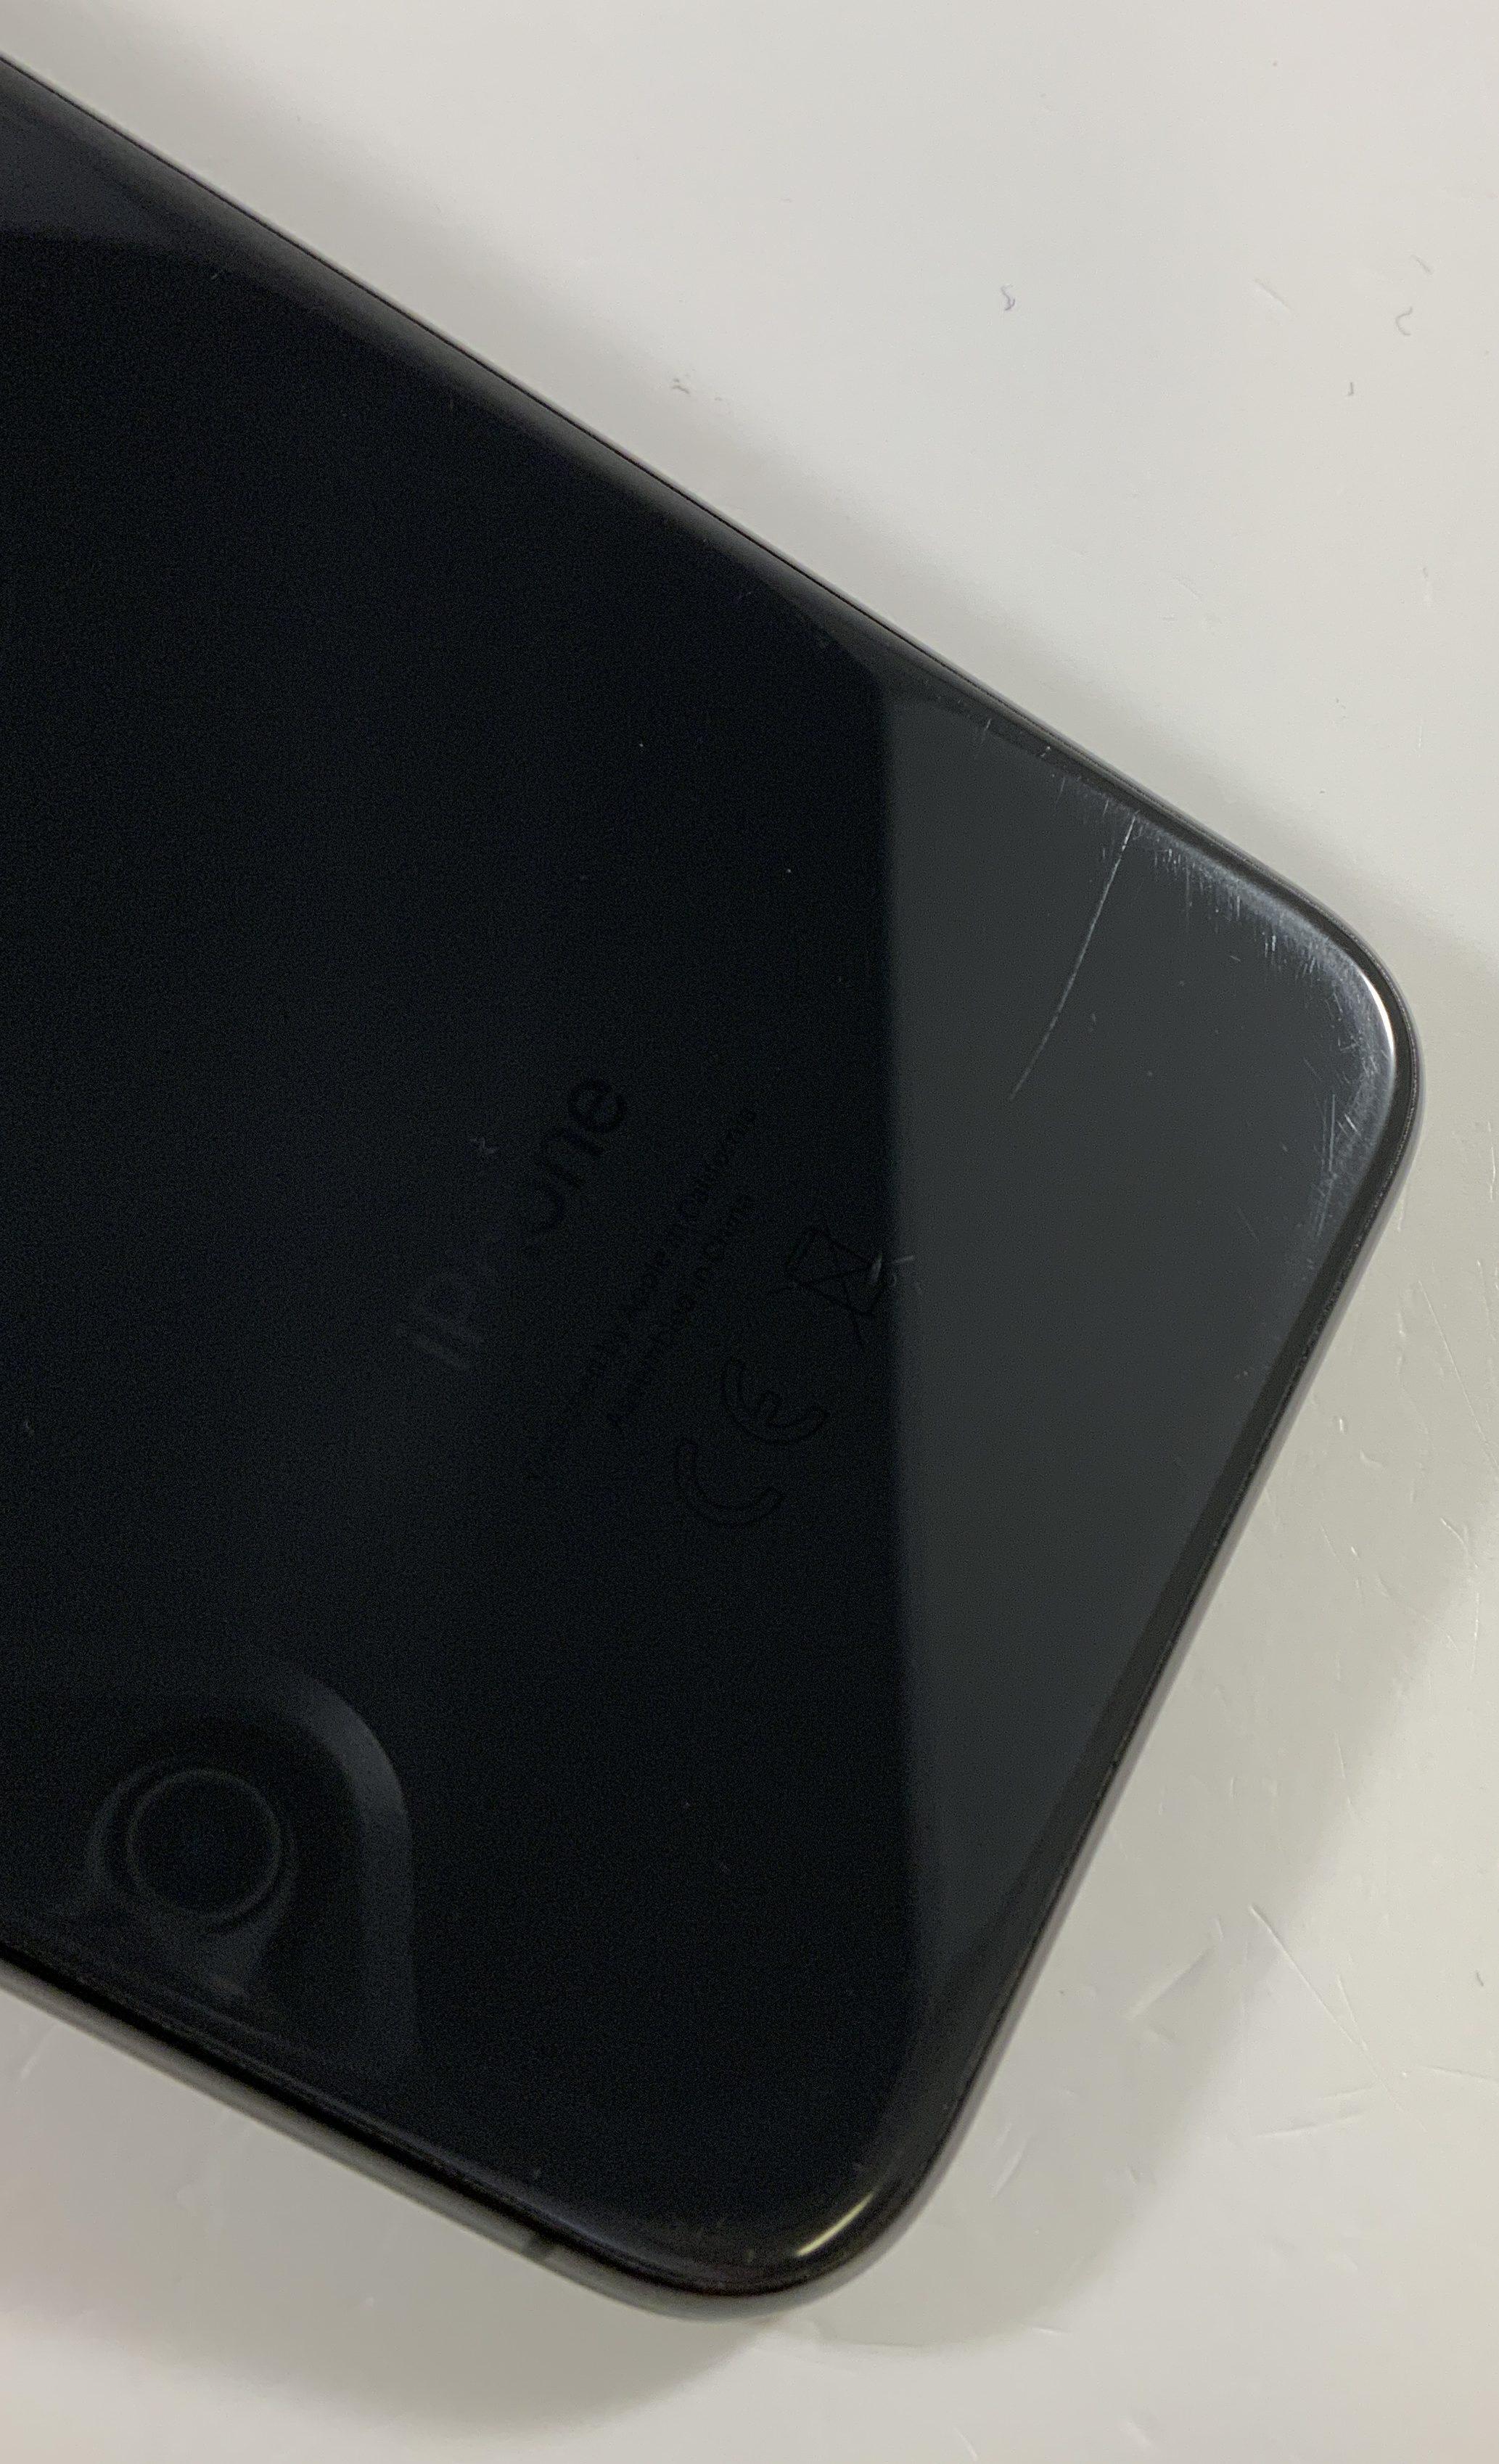 iPhone X 64GB, 64GB, Space Gray, obraz 4